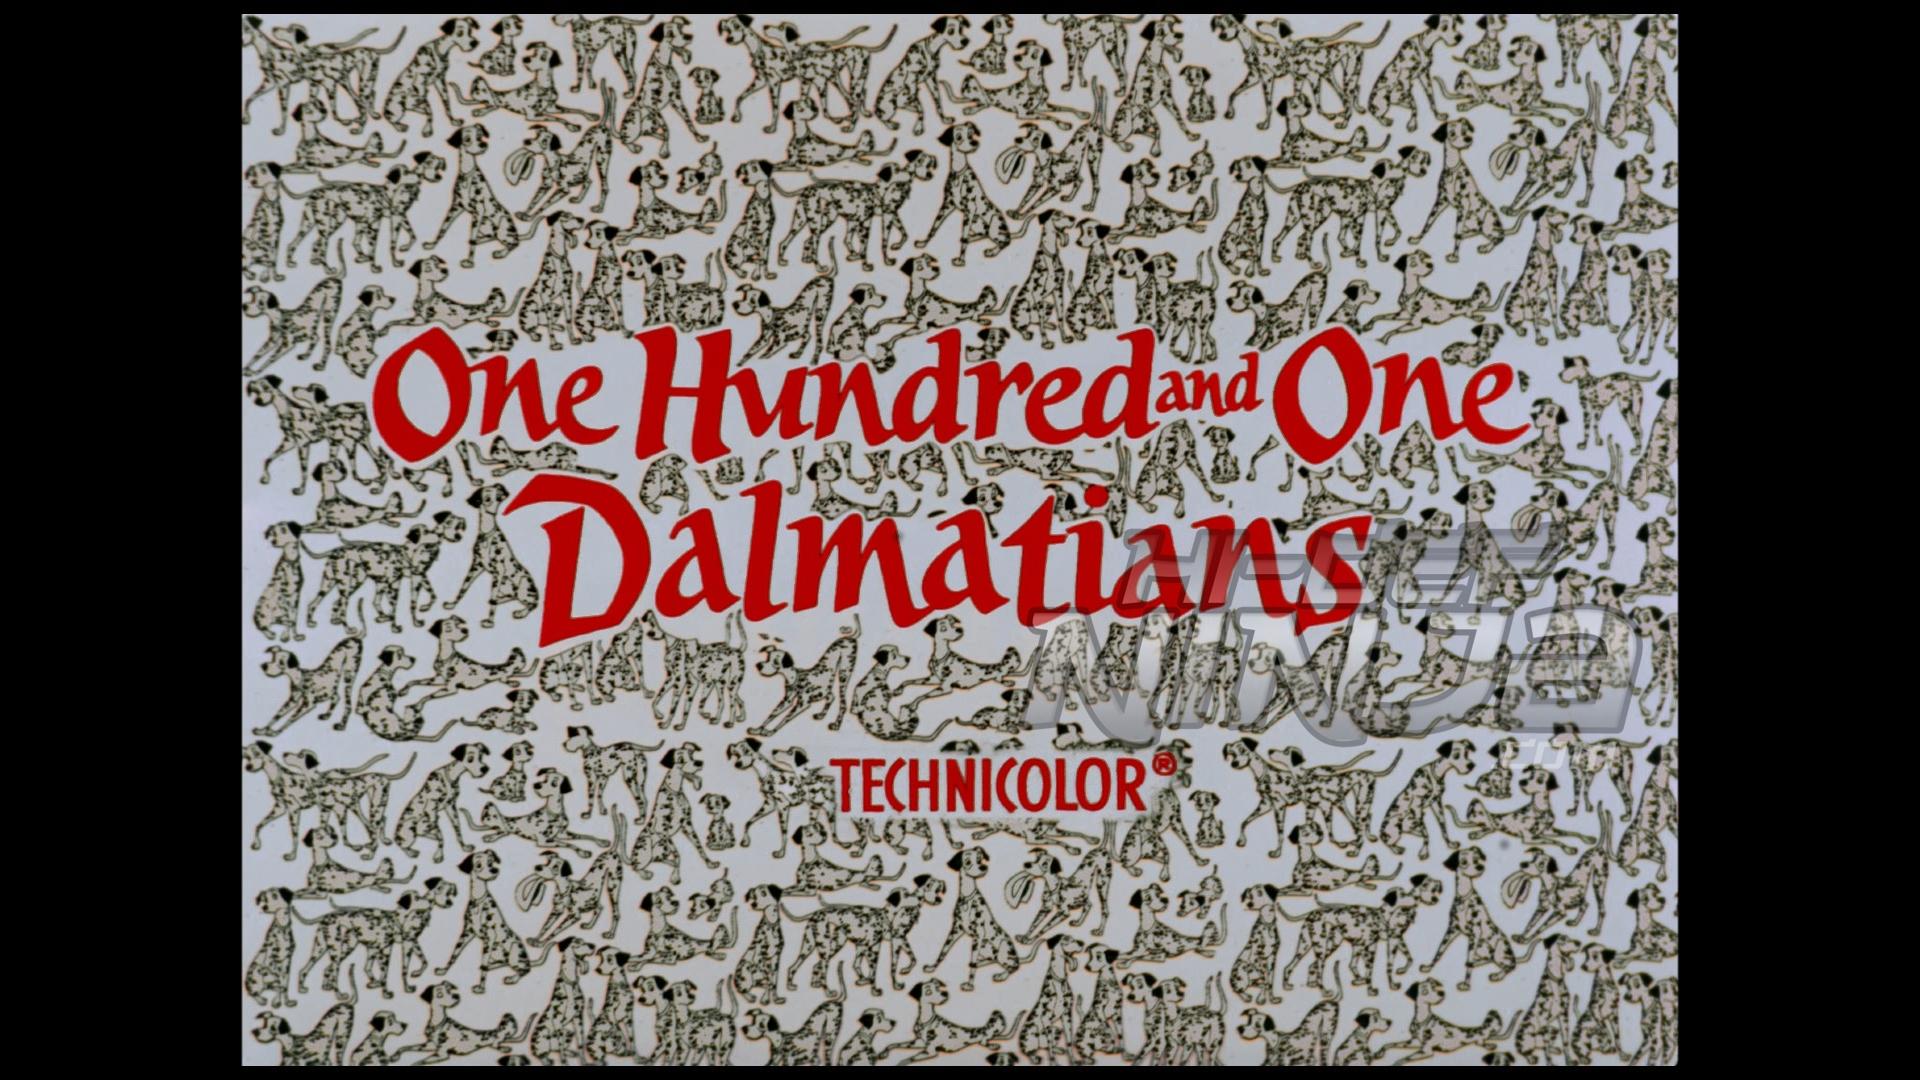 101-dalmations-01